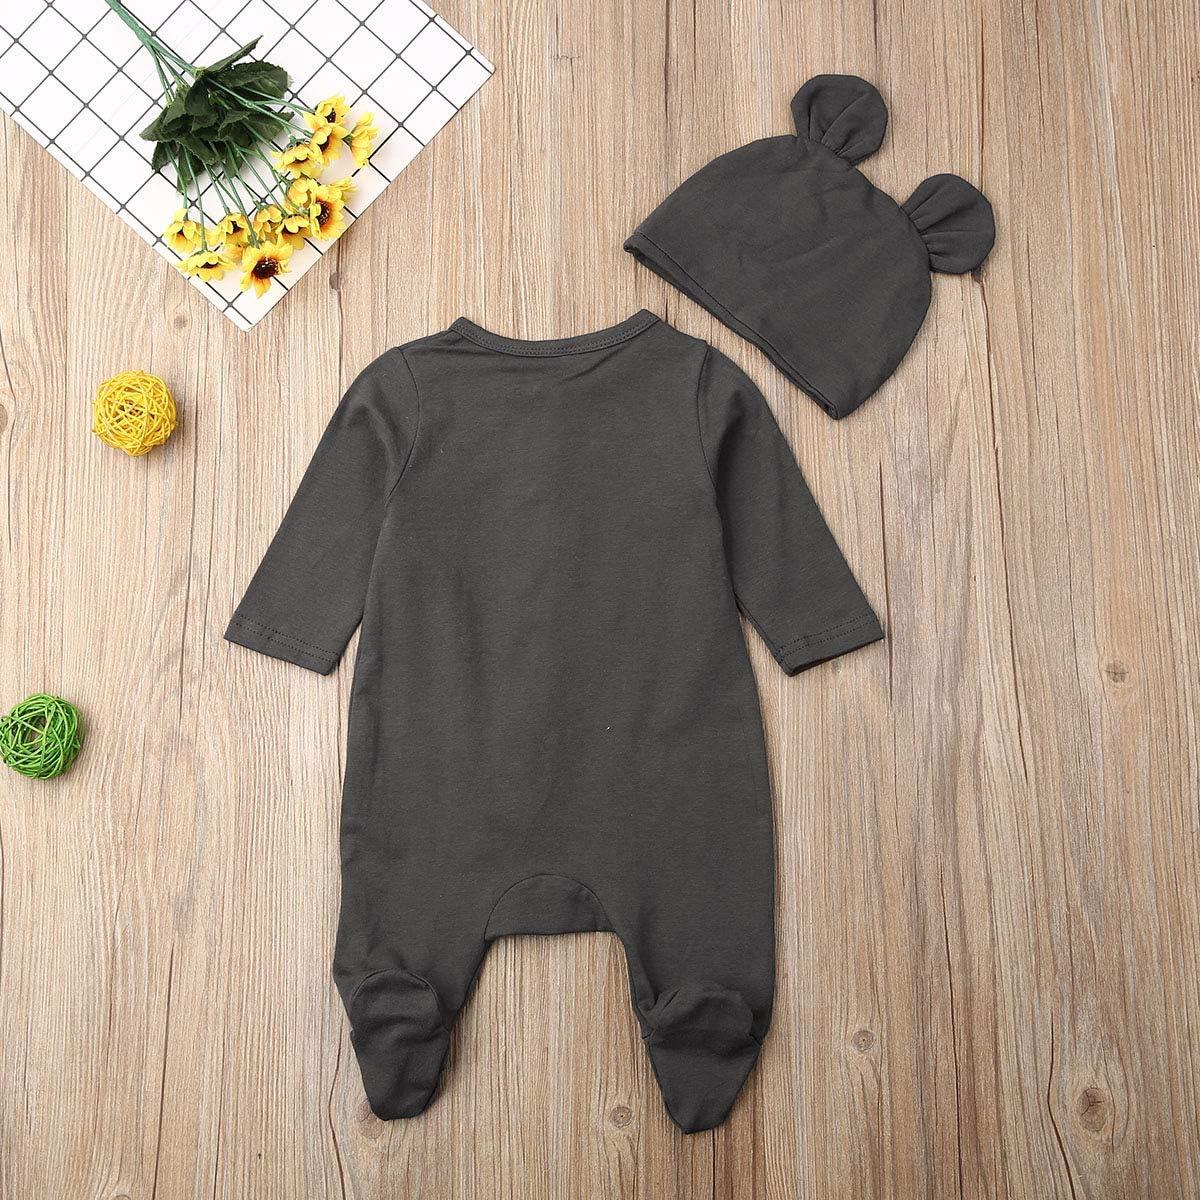 Kuriozud Newborn Baby Girl Boy Footie Romper Leaves Print One Piece Jumpsuit Sleeper with Headband Clothes